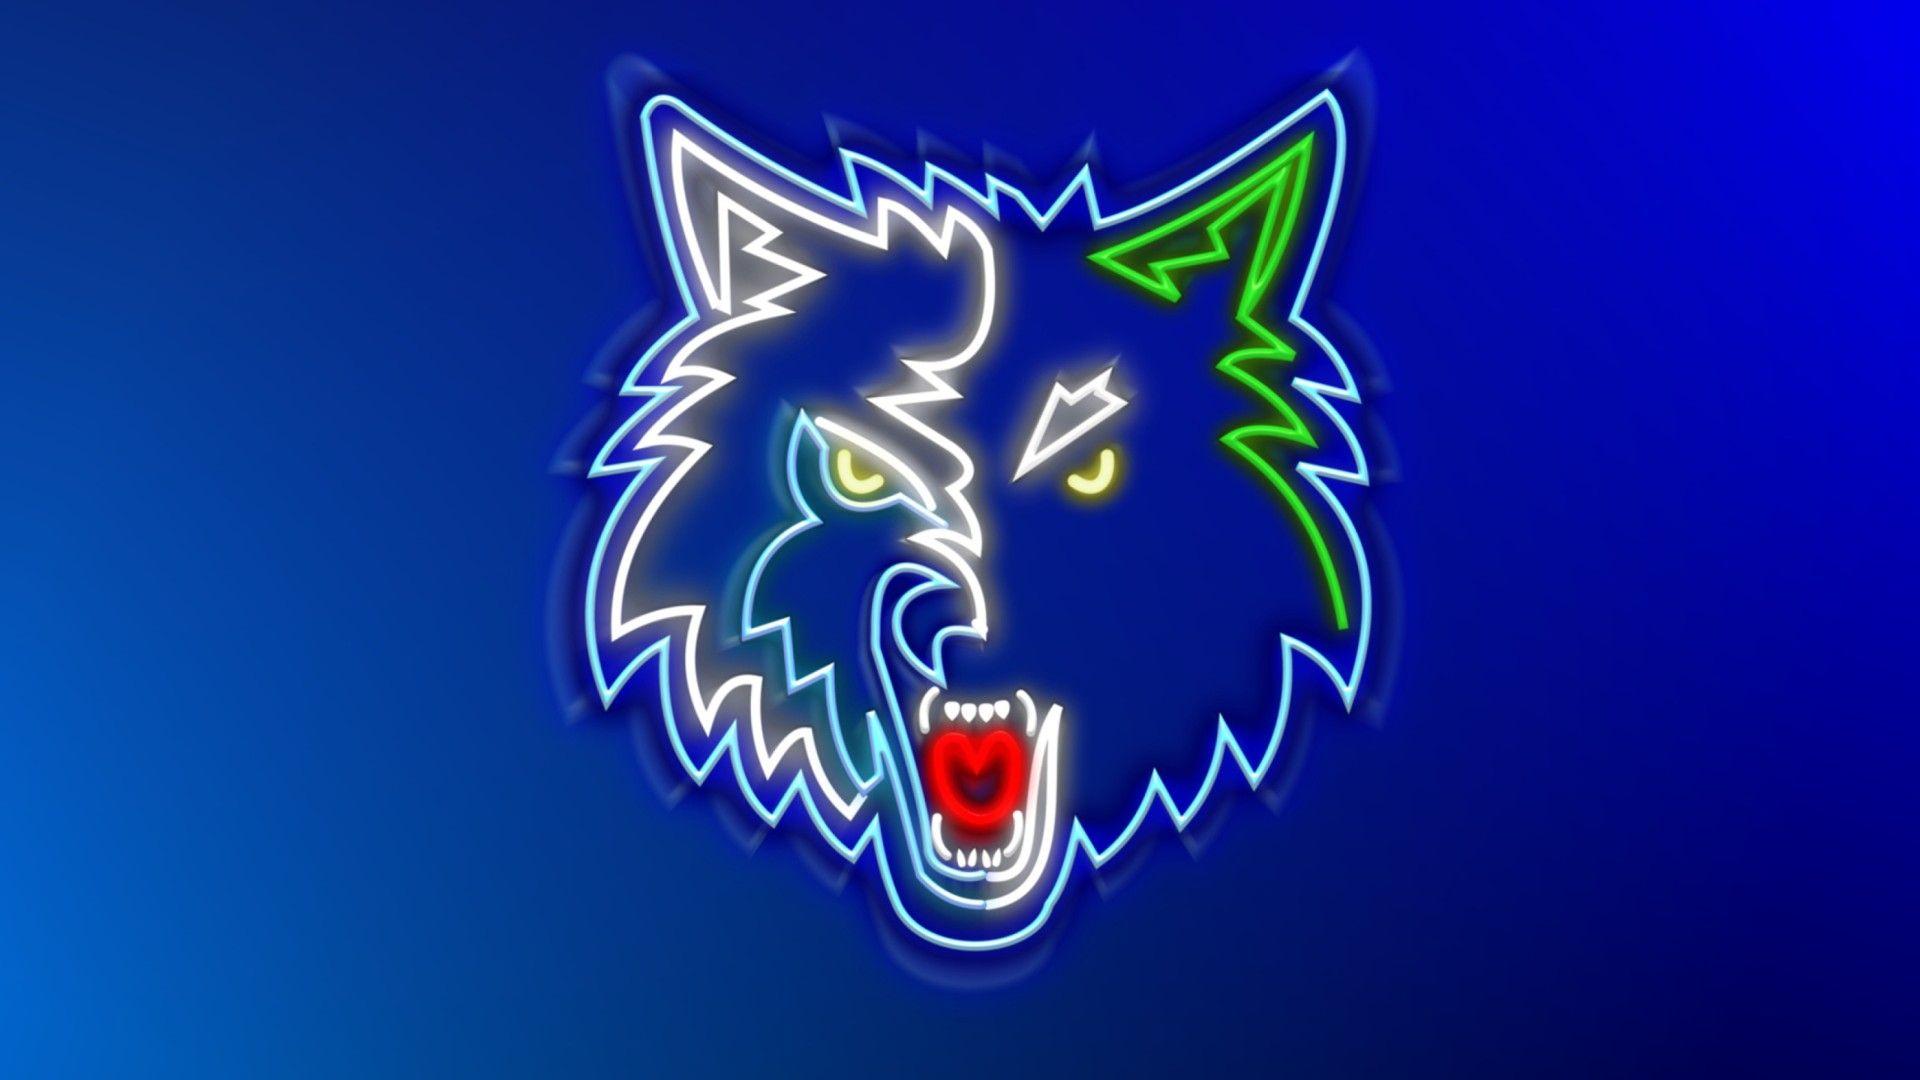 Minnesota Timberwolves wallpaper picture